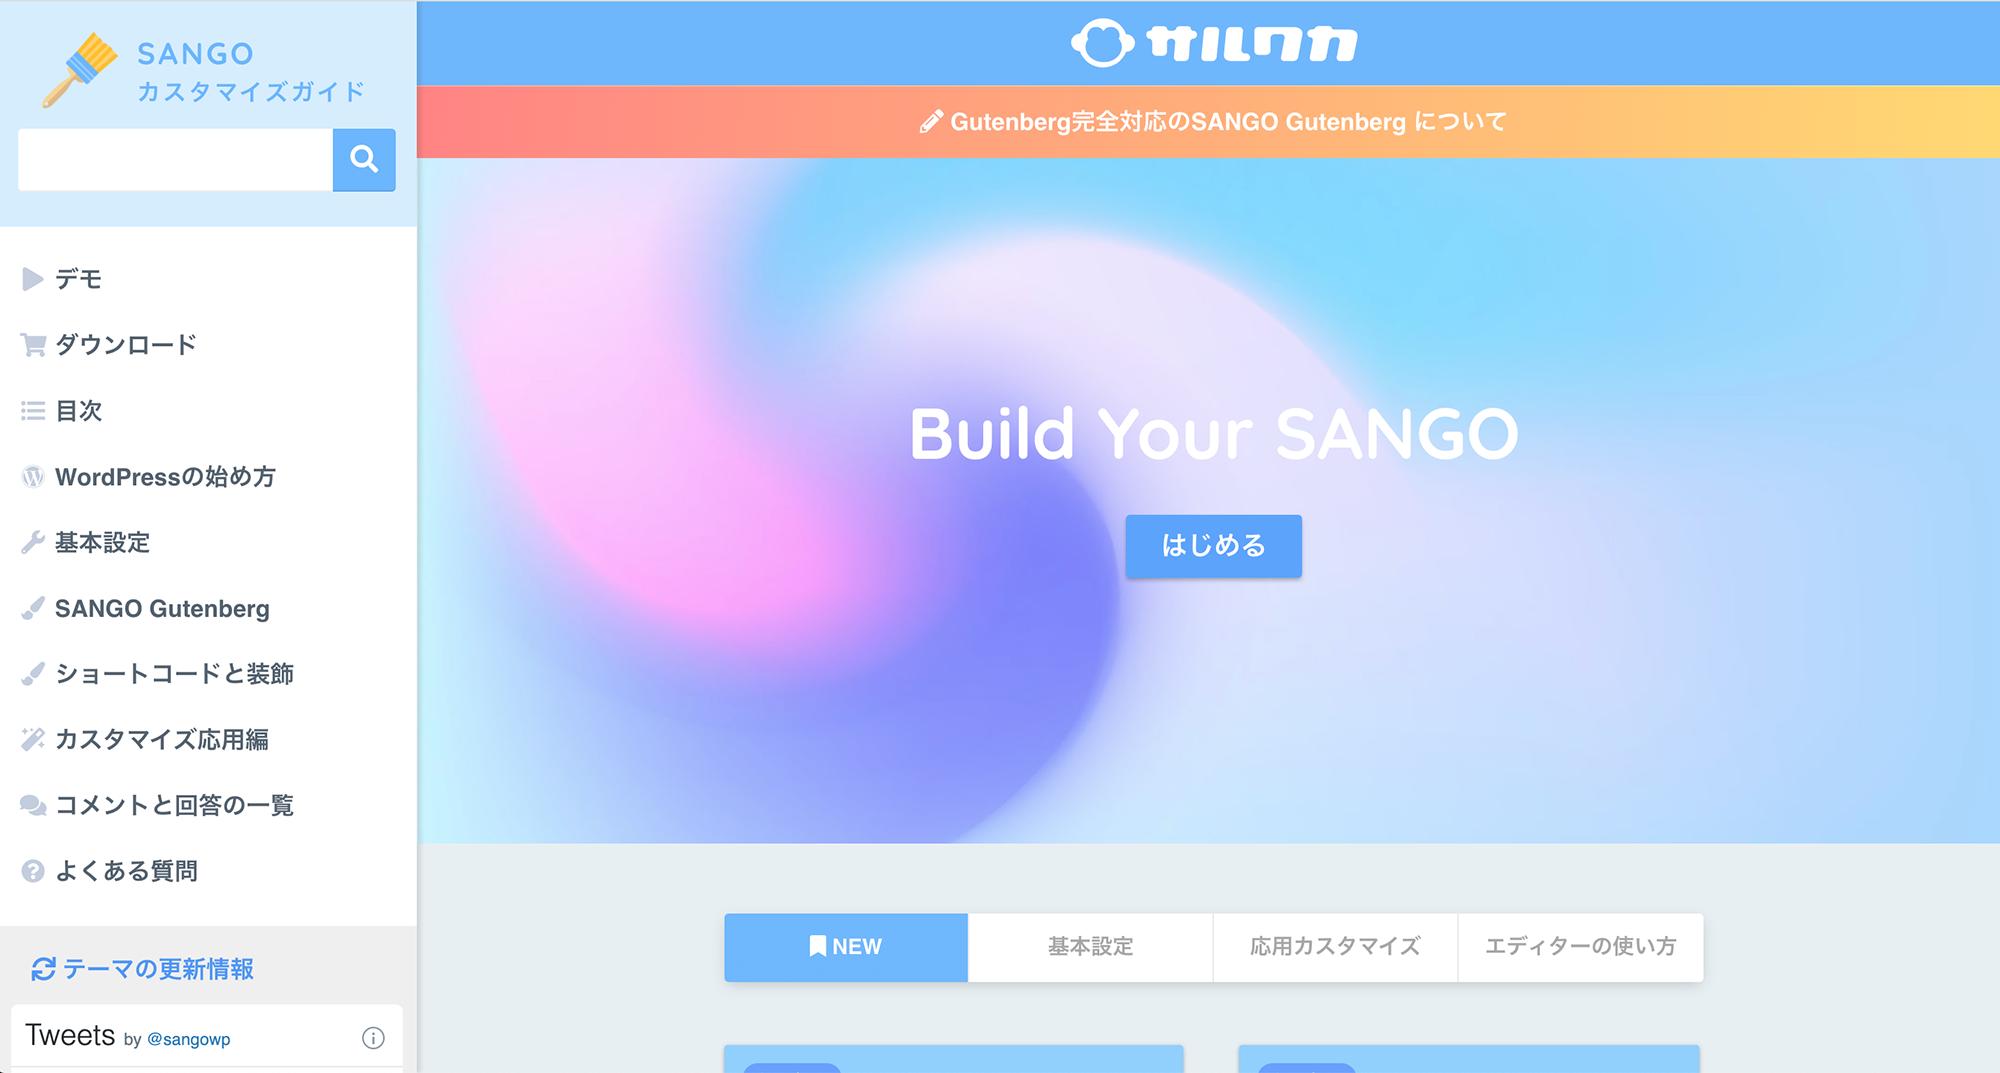 SANGOの使い方ガイドサイト